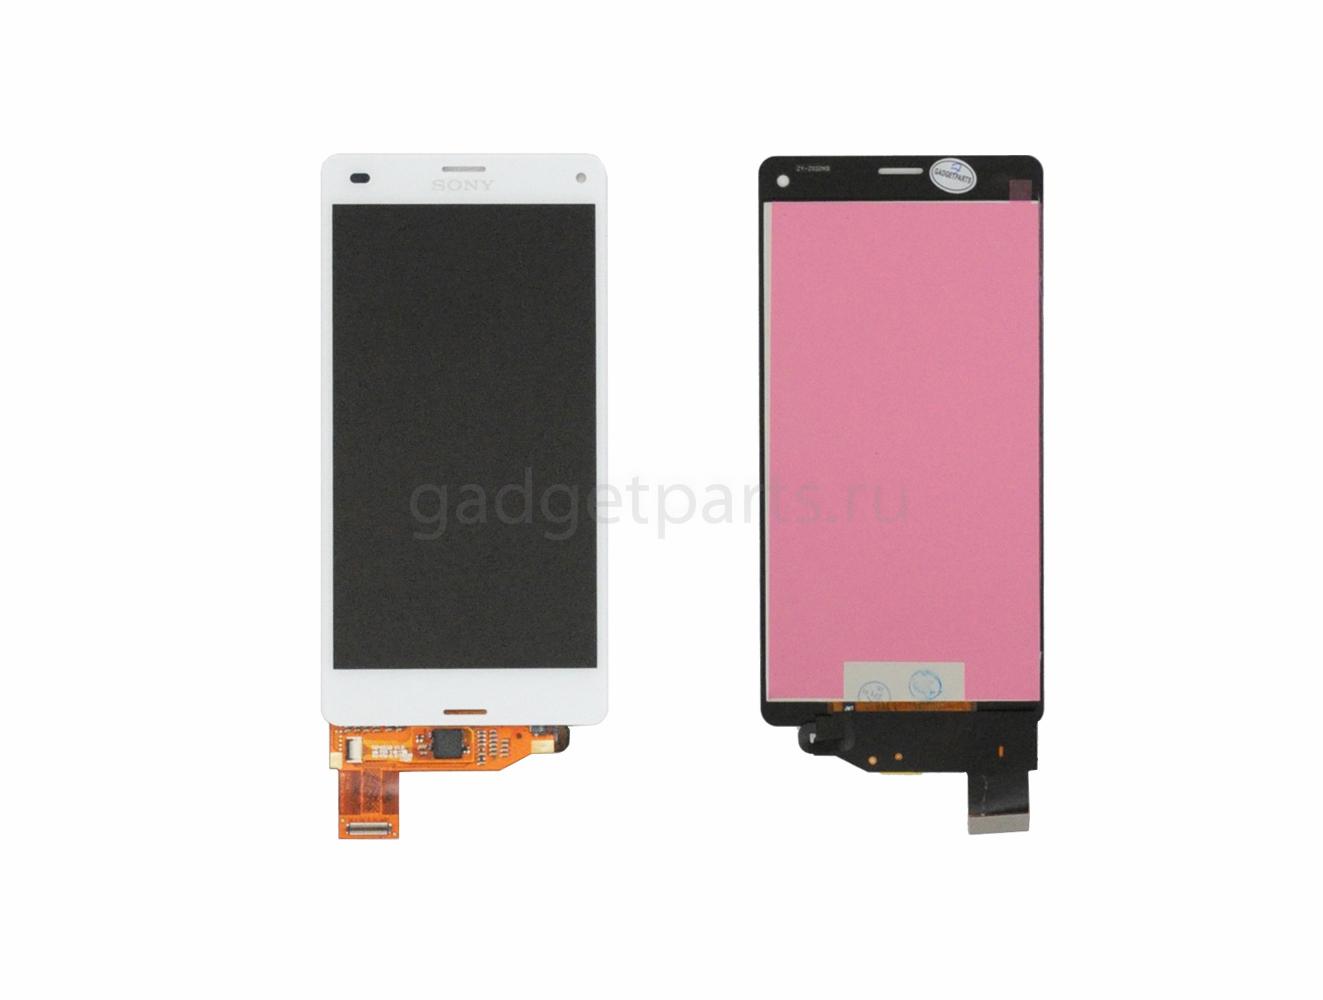 Модуль (дисплей, тачскрин) Sony Xperia Z3 Compact, D5803, D5833 Белый (White)